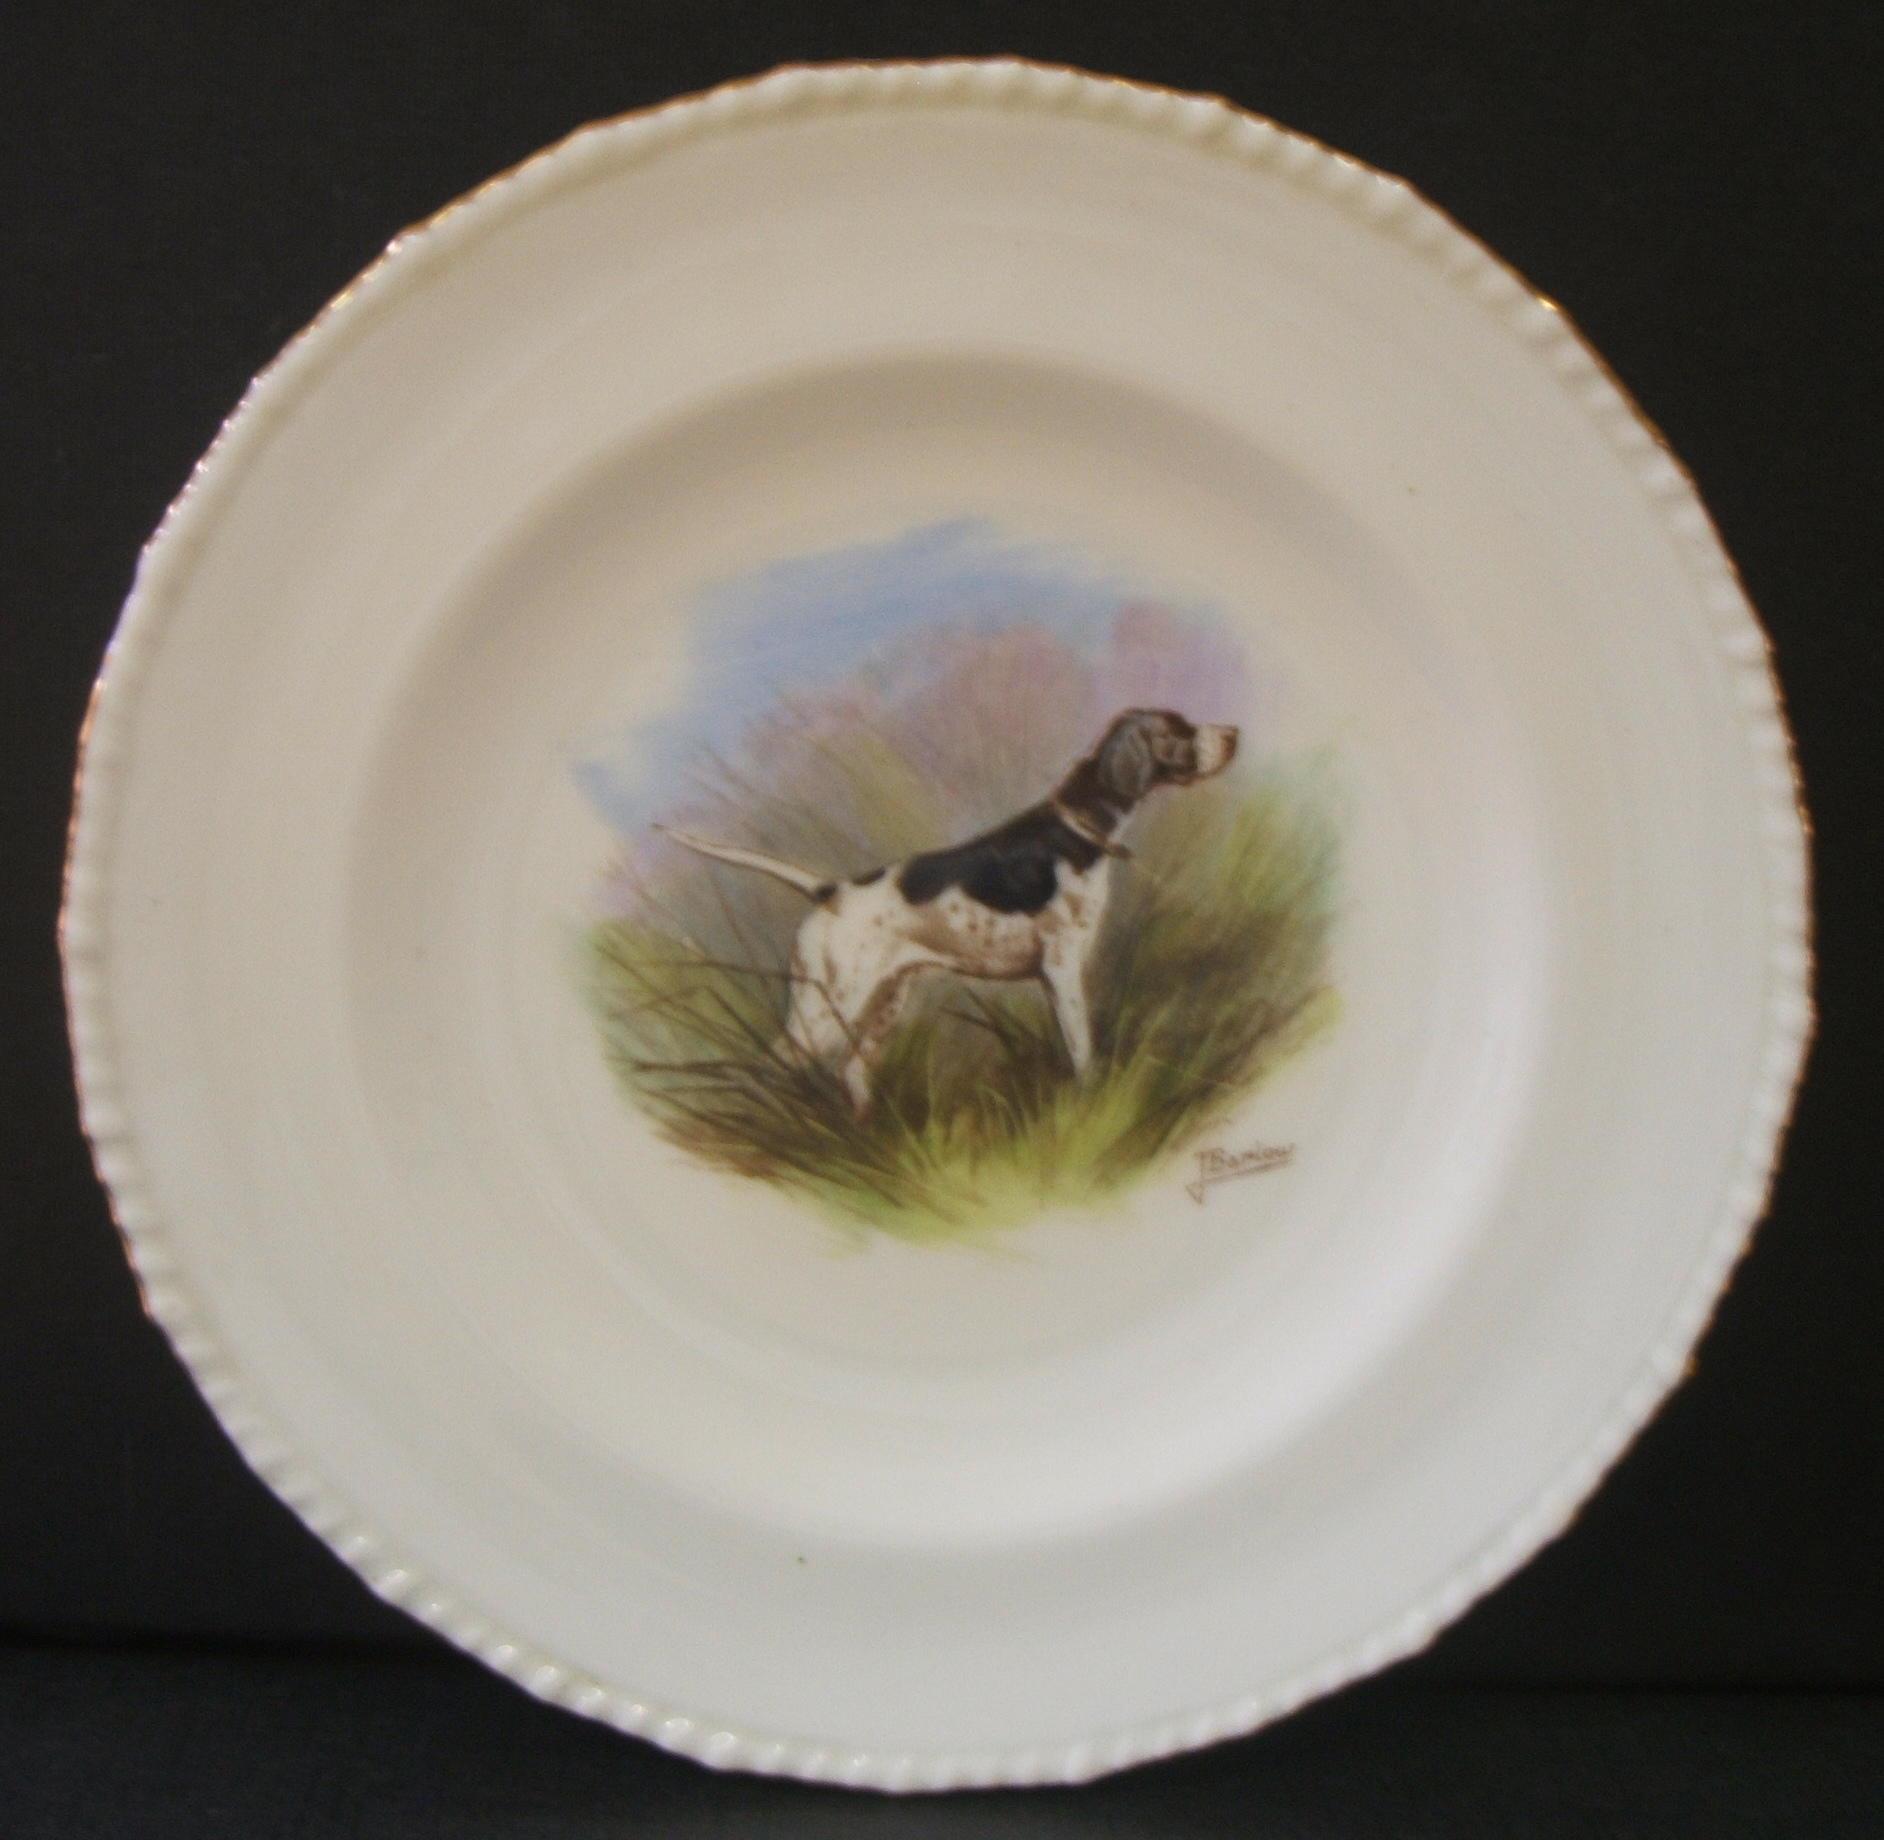 royal-crown-derby-stanhope-shape-plate-hunting-dog-j-barlow